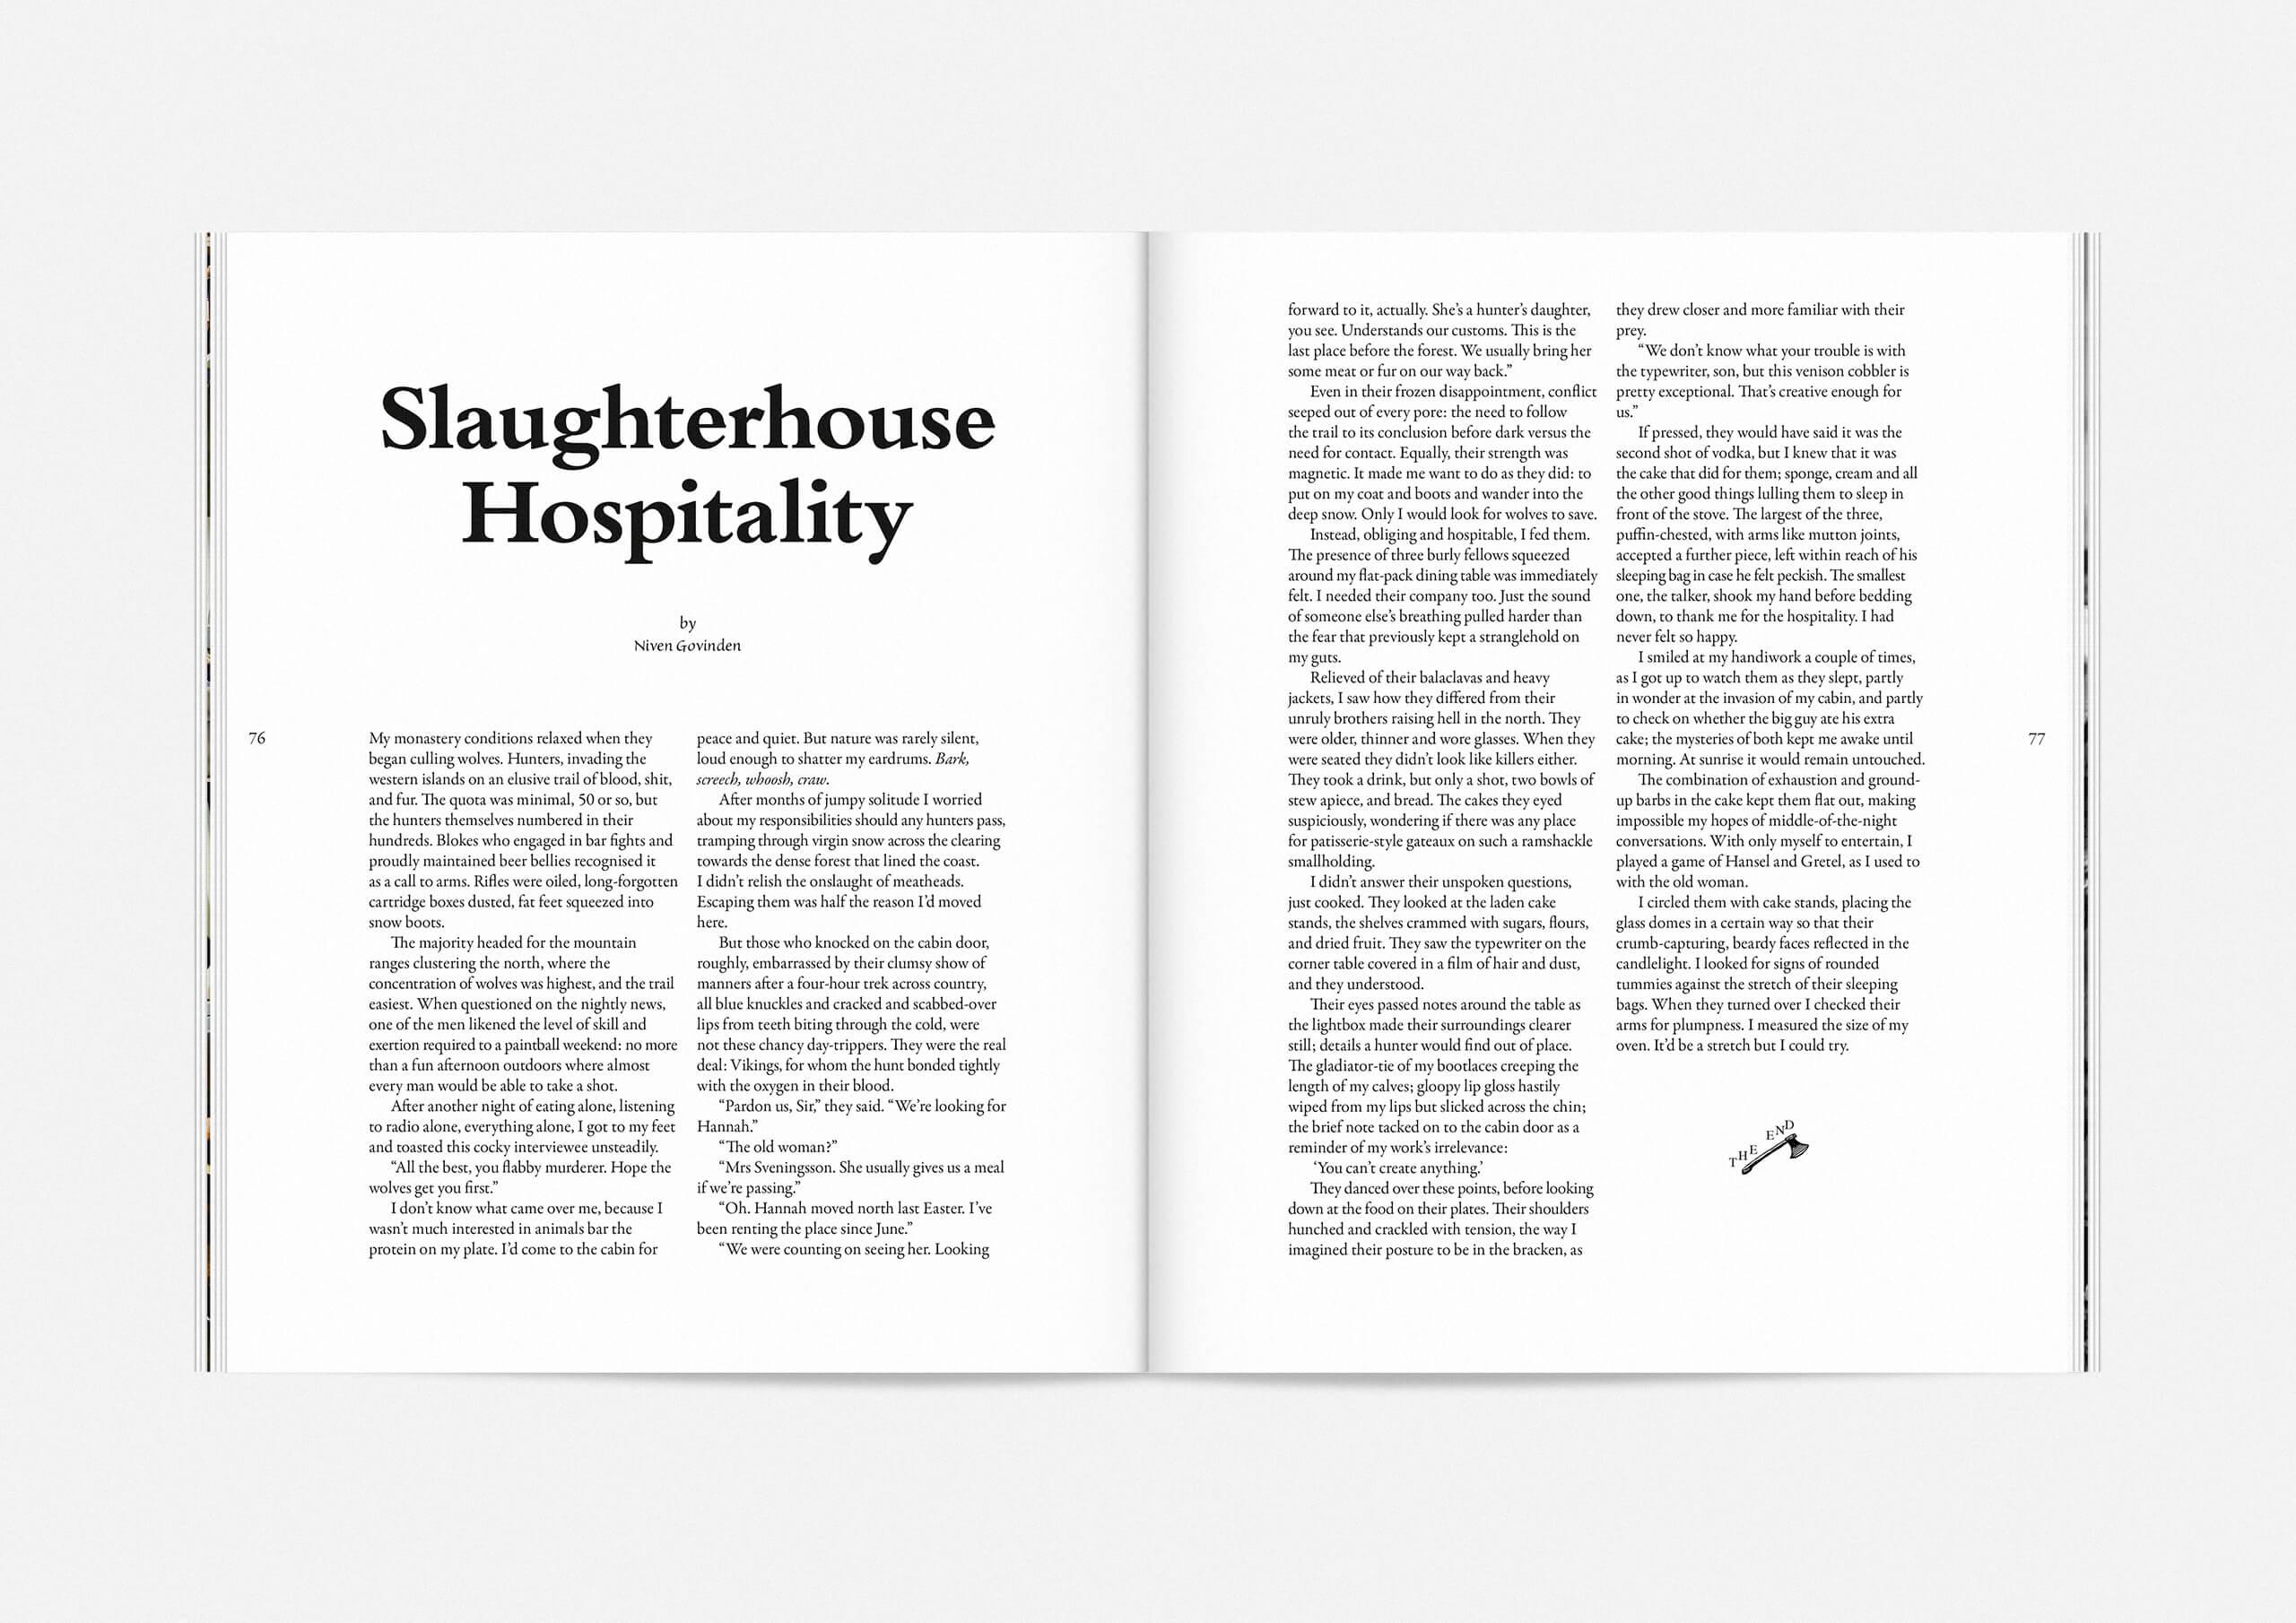 https://neuegestaltung.de/media/pages/clients/teller-magazine-issue-2/226f2f3076-1597415083/teller_issue_02_innenseite_76_77_ng.jpg